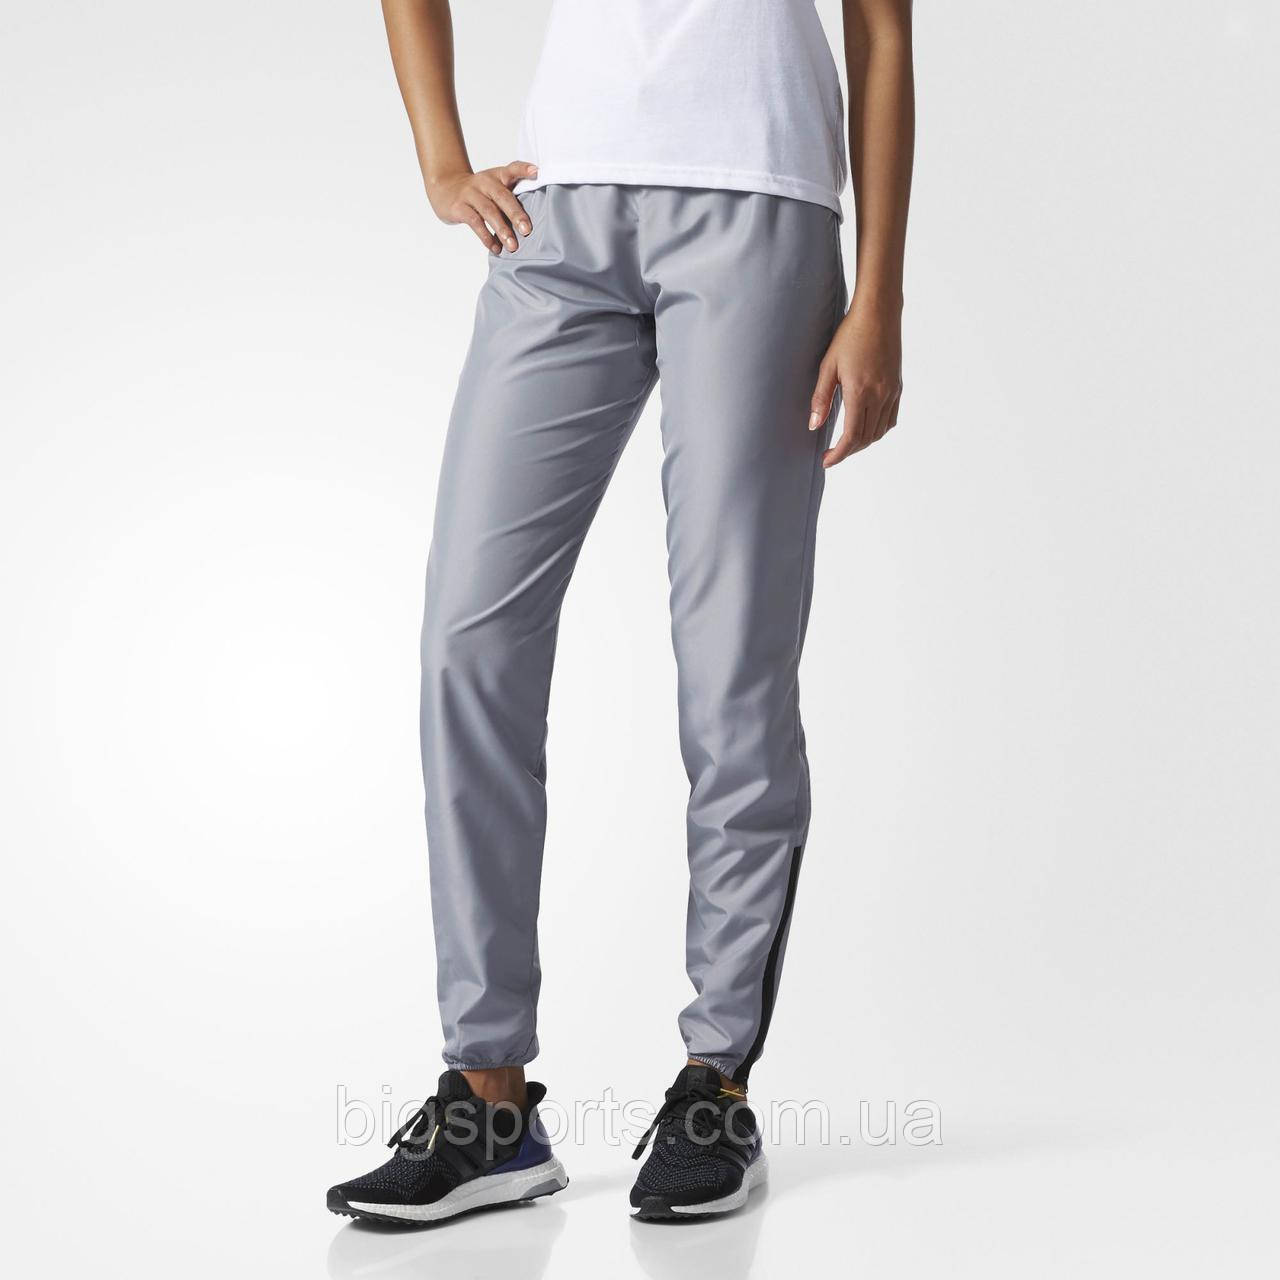 4205fda2 Штаны жен. Adidas RS Wind Pant W (арт. B47757), цена 790 грн ...